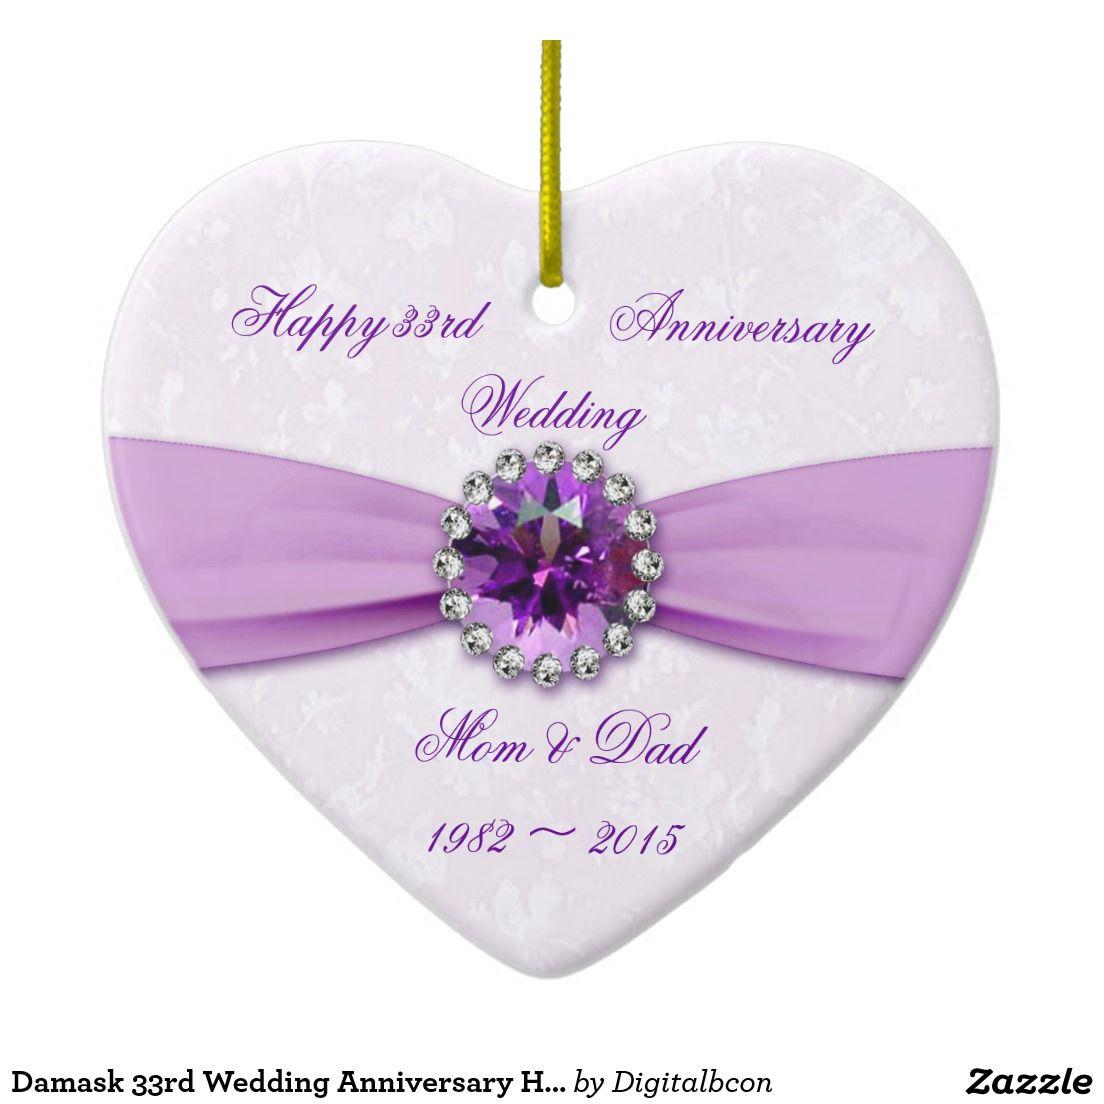 33rd Wedding Anniversary Gift: Damask 33rd Wedding Anniversary Heart Ornament